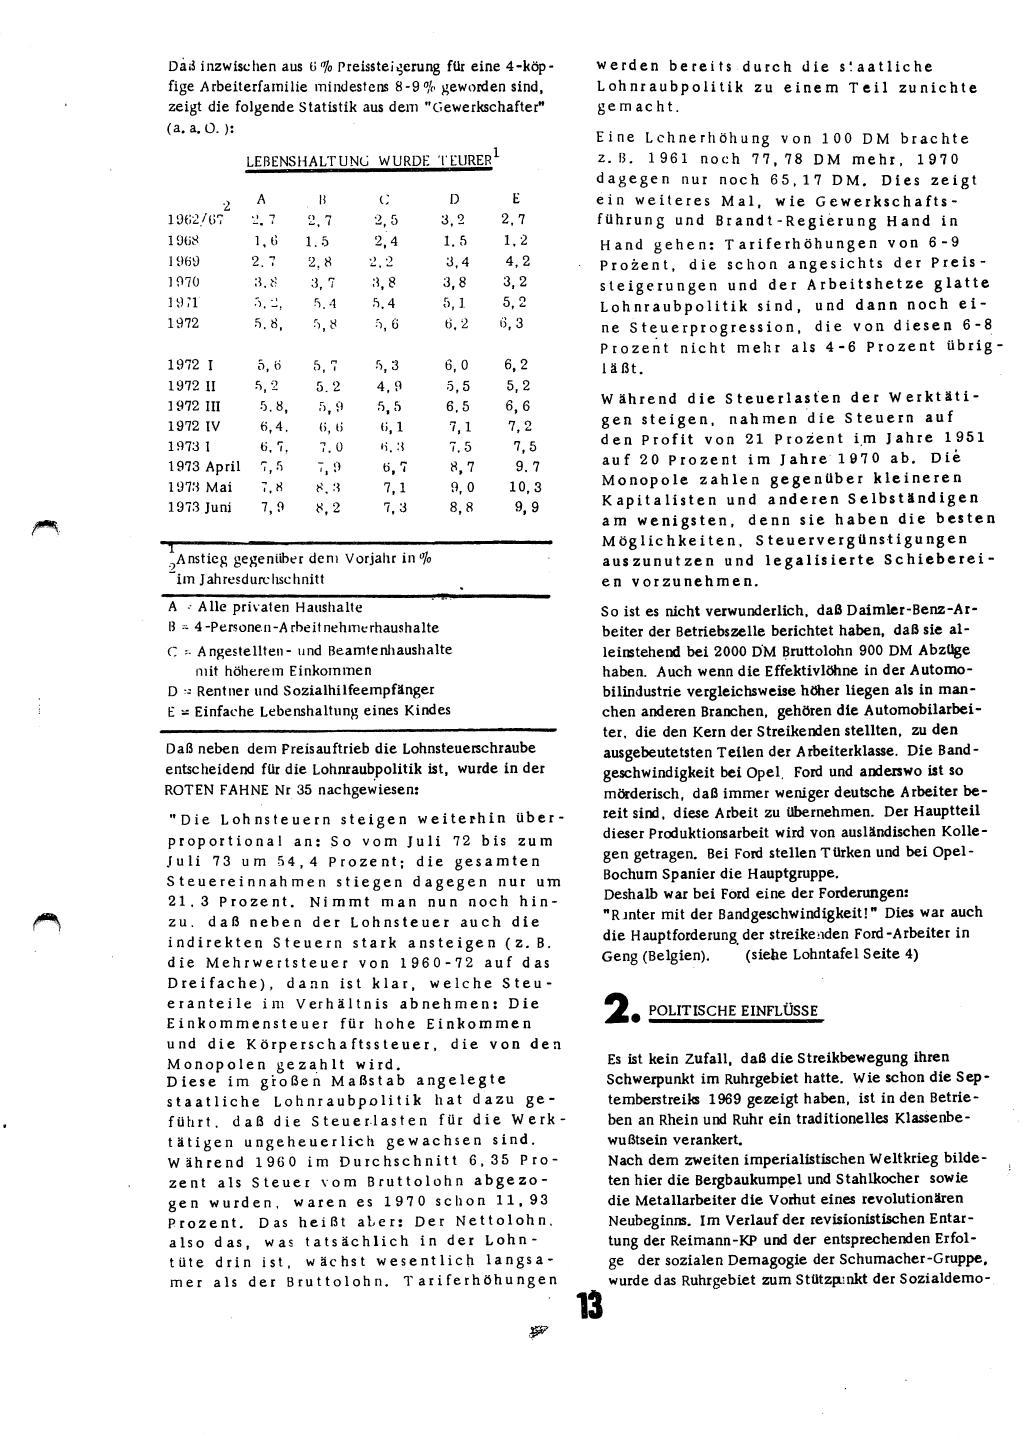 KSV_Grundschulung_1975_01_32